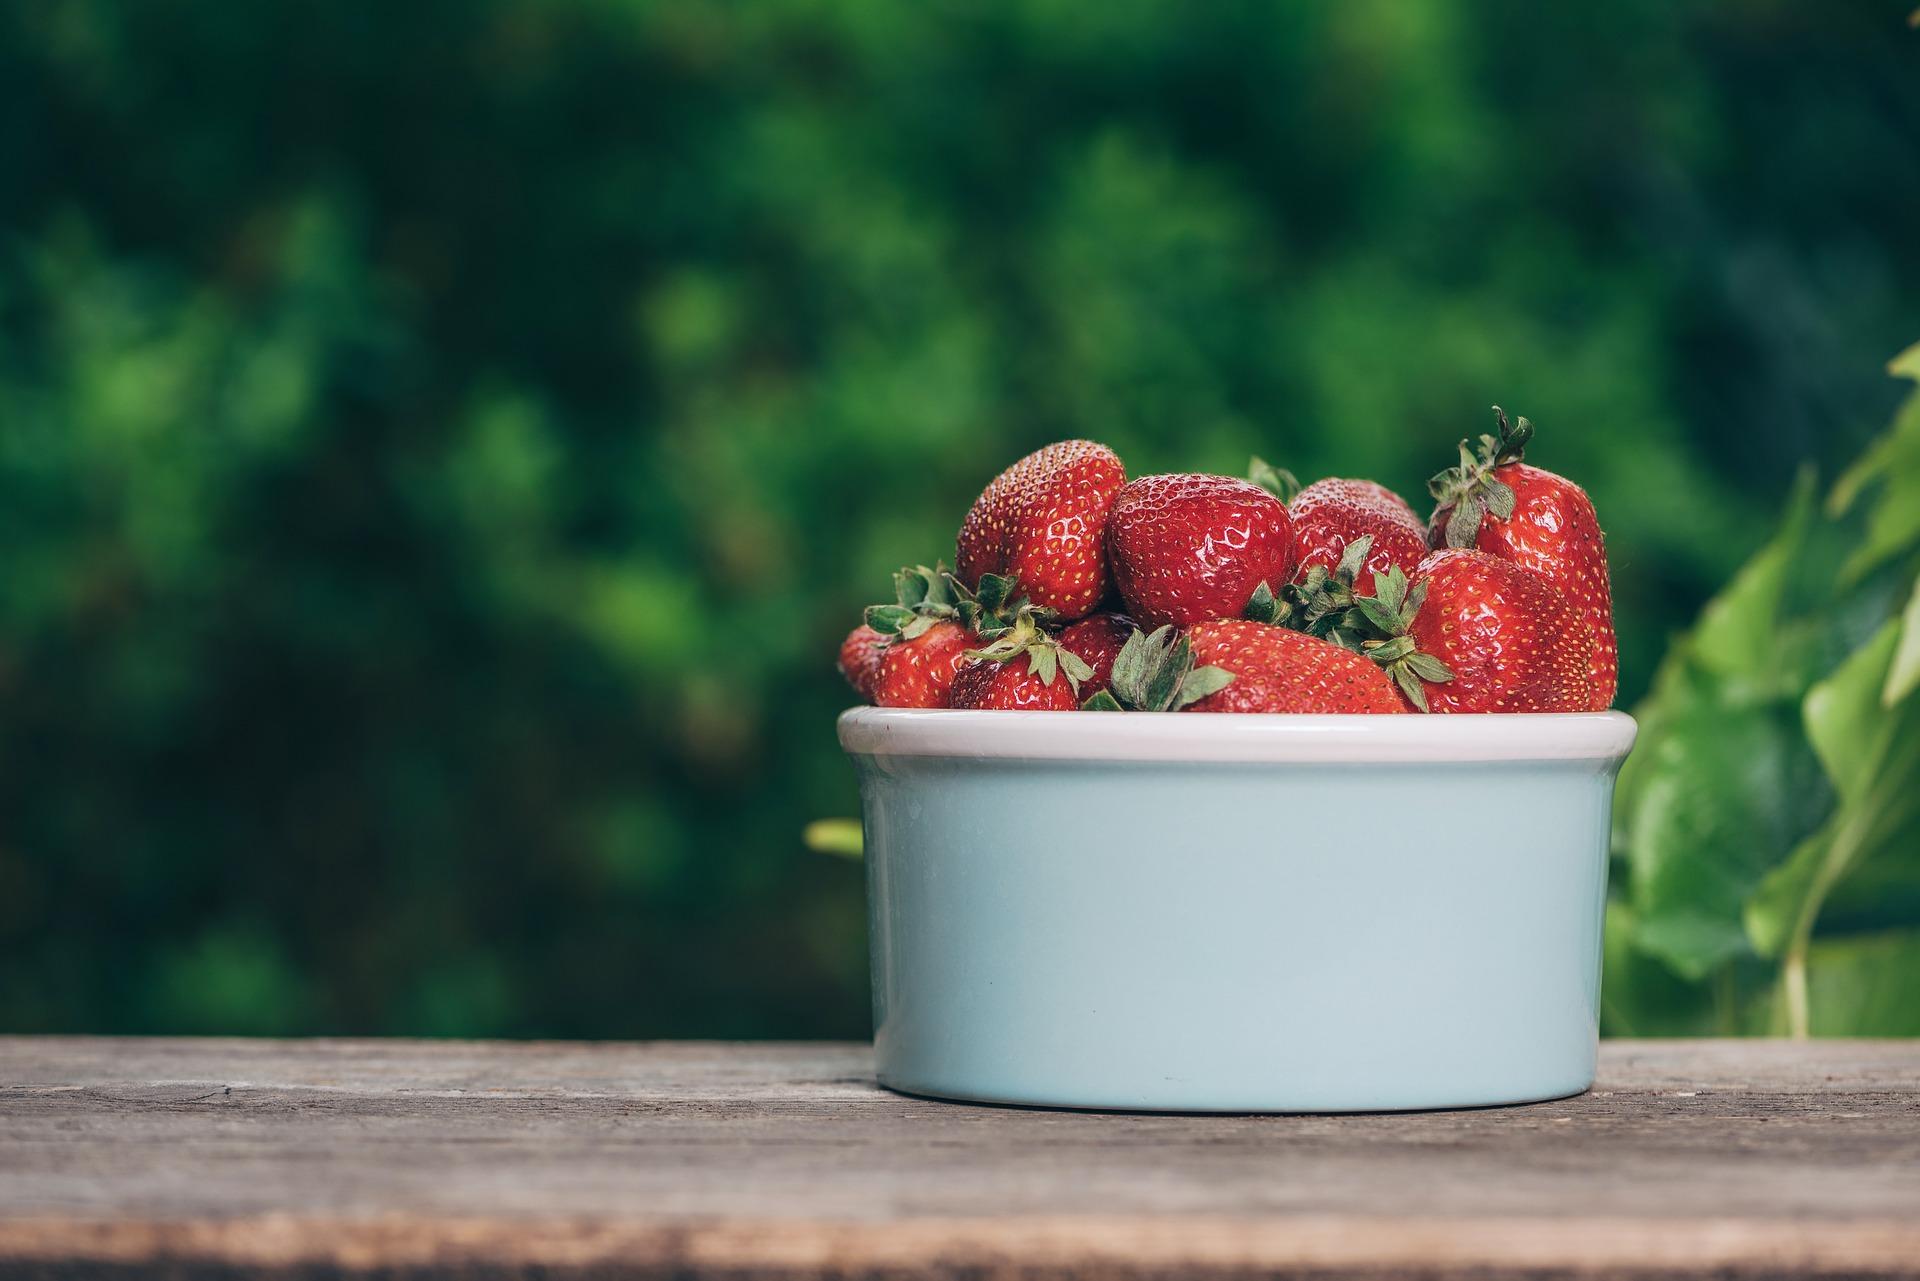 strawberry-4186310_1920.jpg